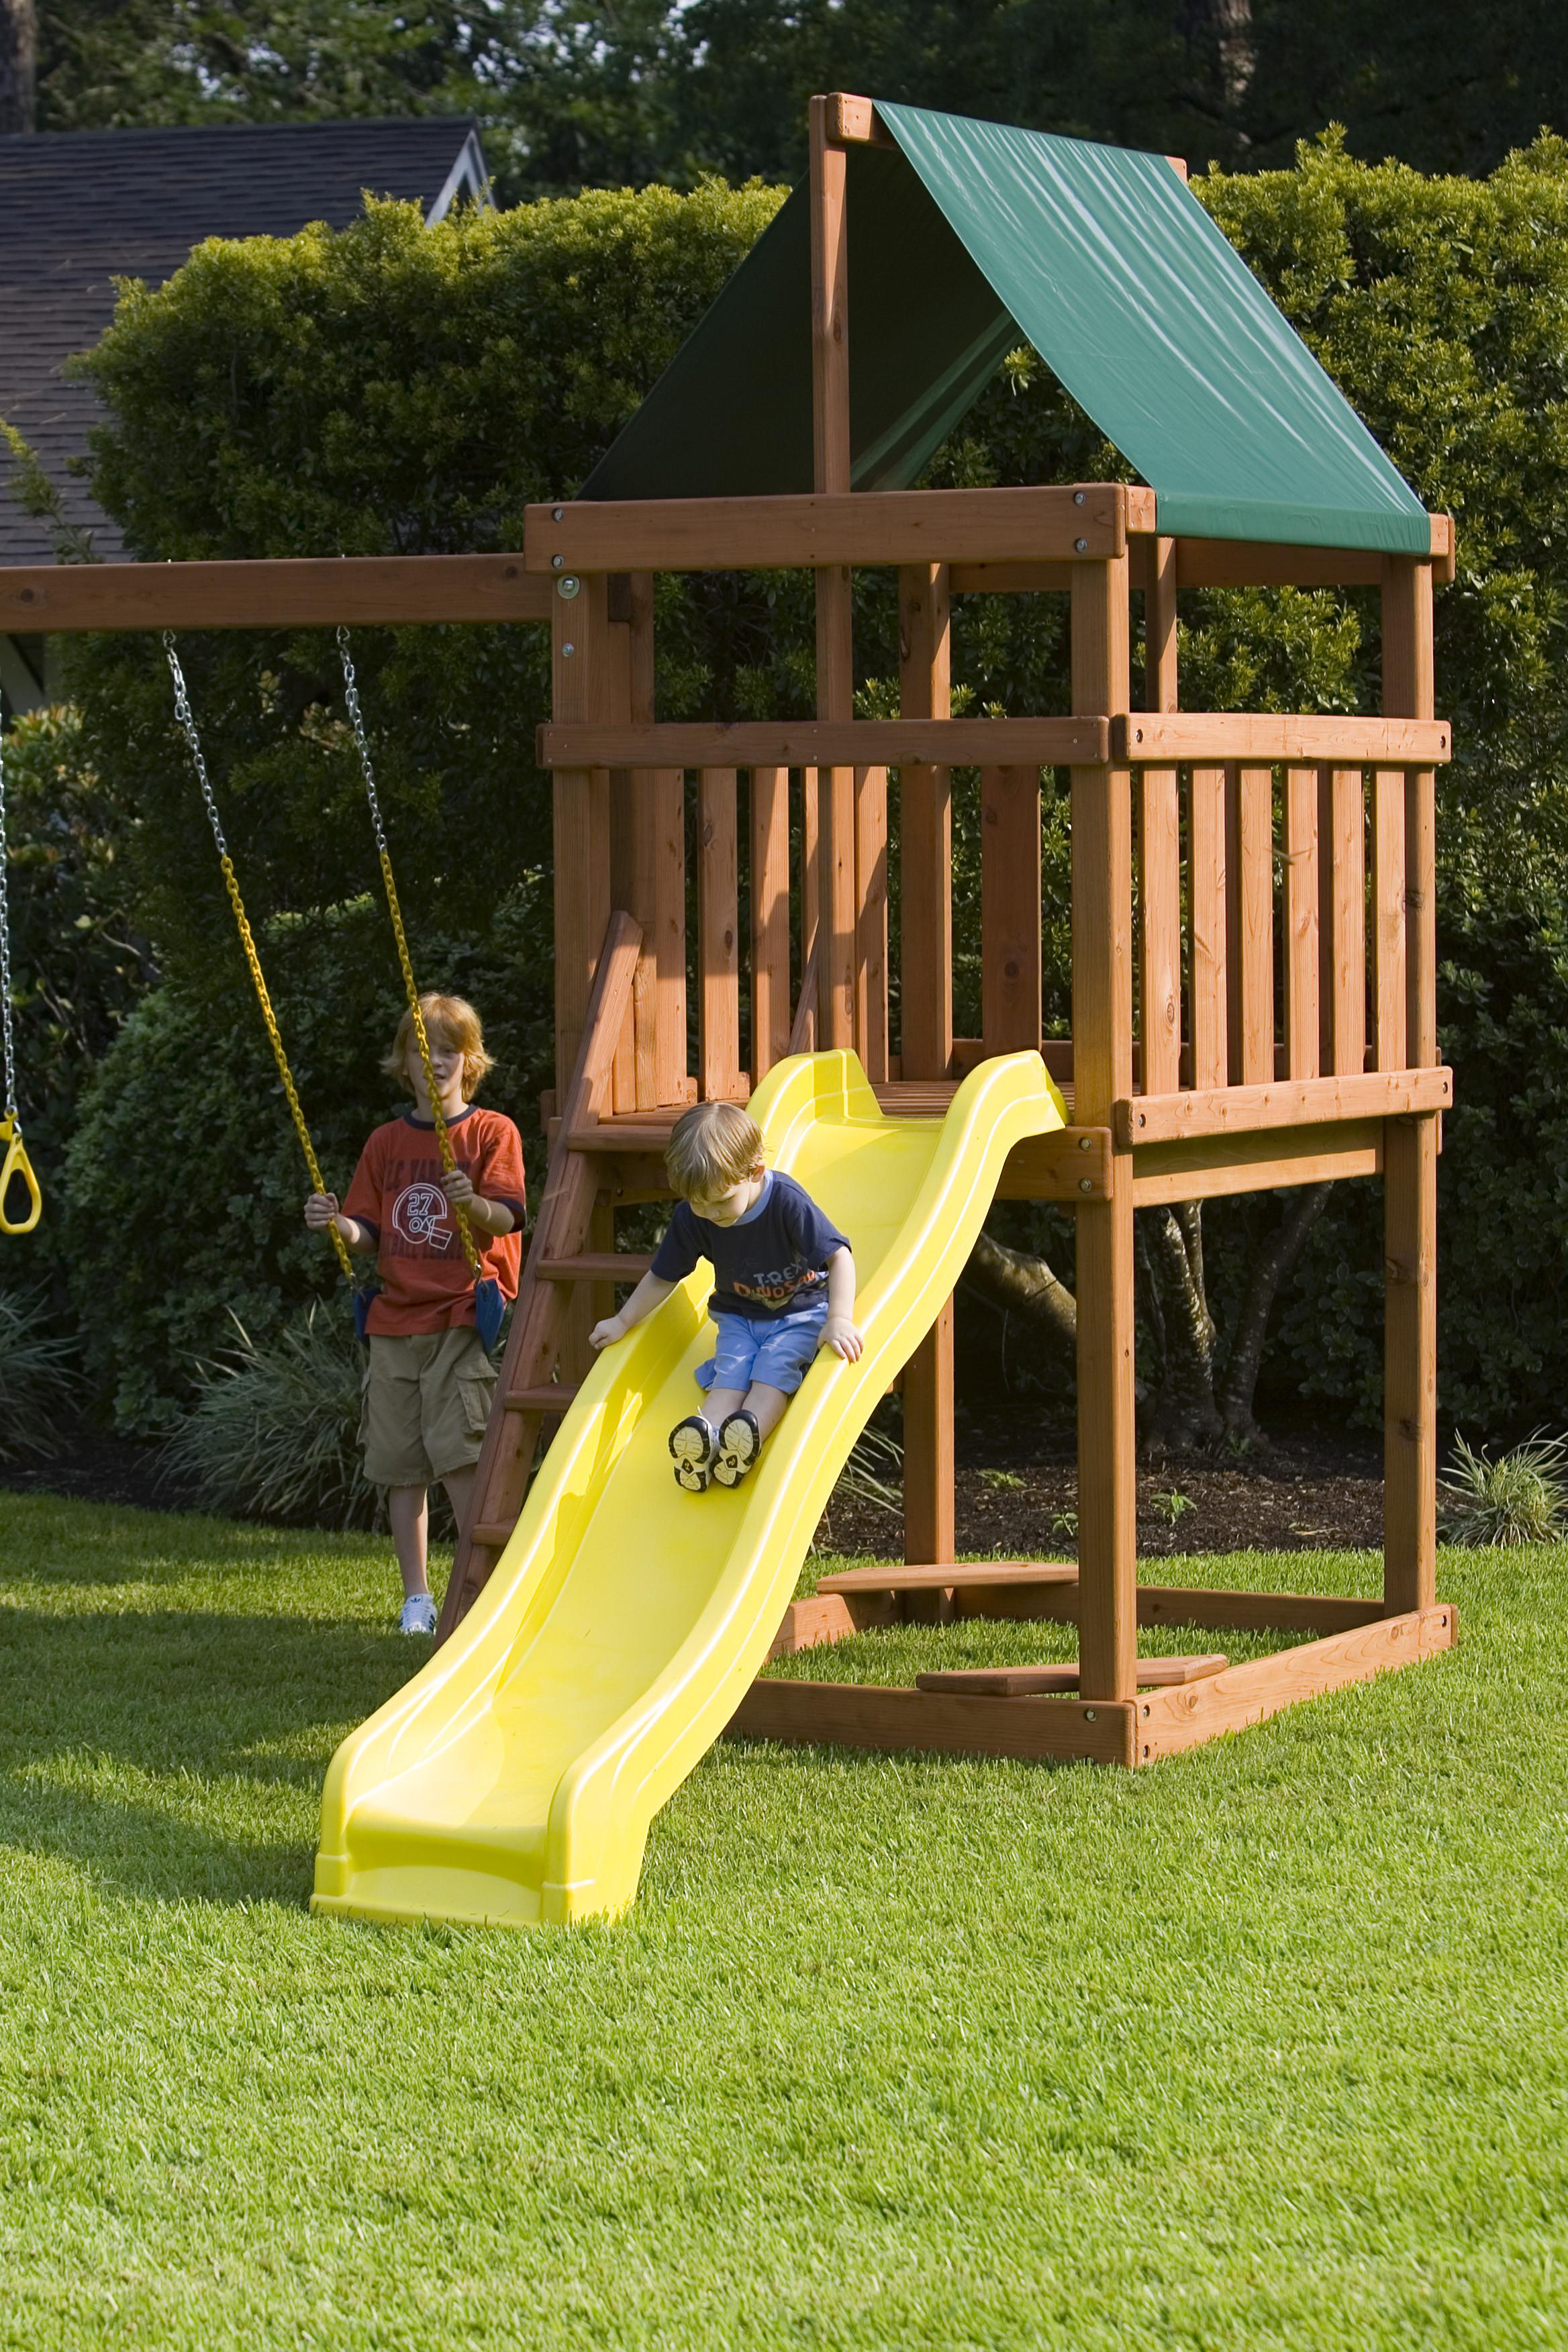 DIY Swing Set Plans  Endeavor Playset DIY Fort and Swingset Plans